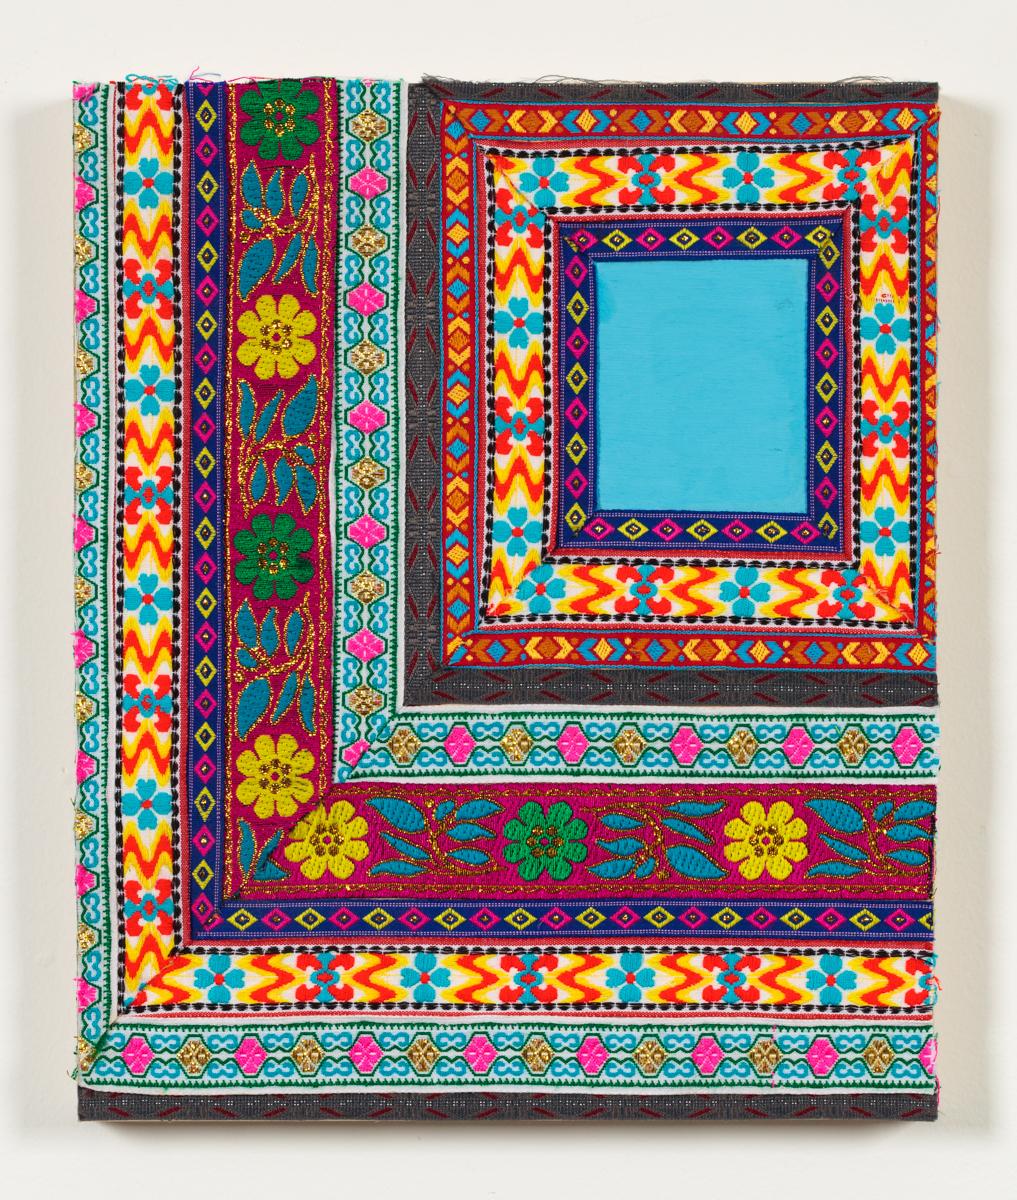 "Textile Surrogate, III,2014 Jacquard fabric and gouache on wood panel 16"" x 12"""